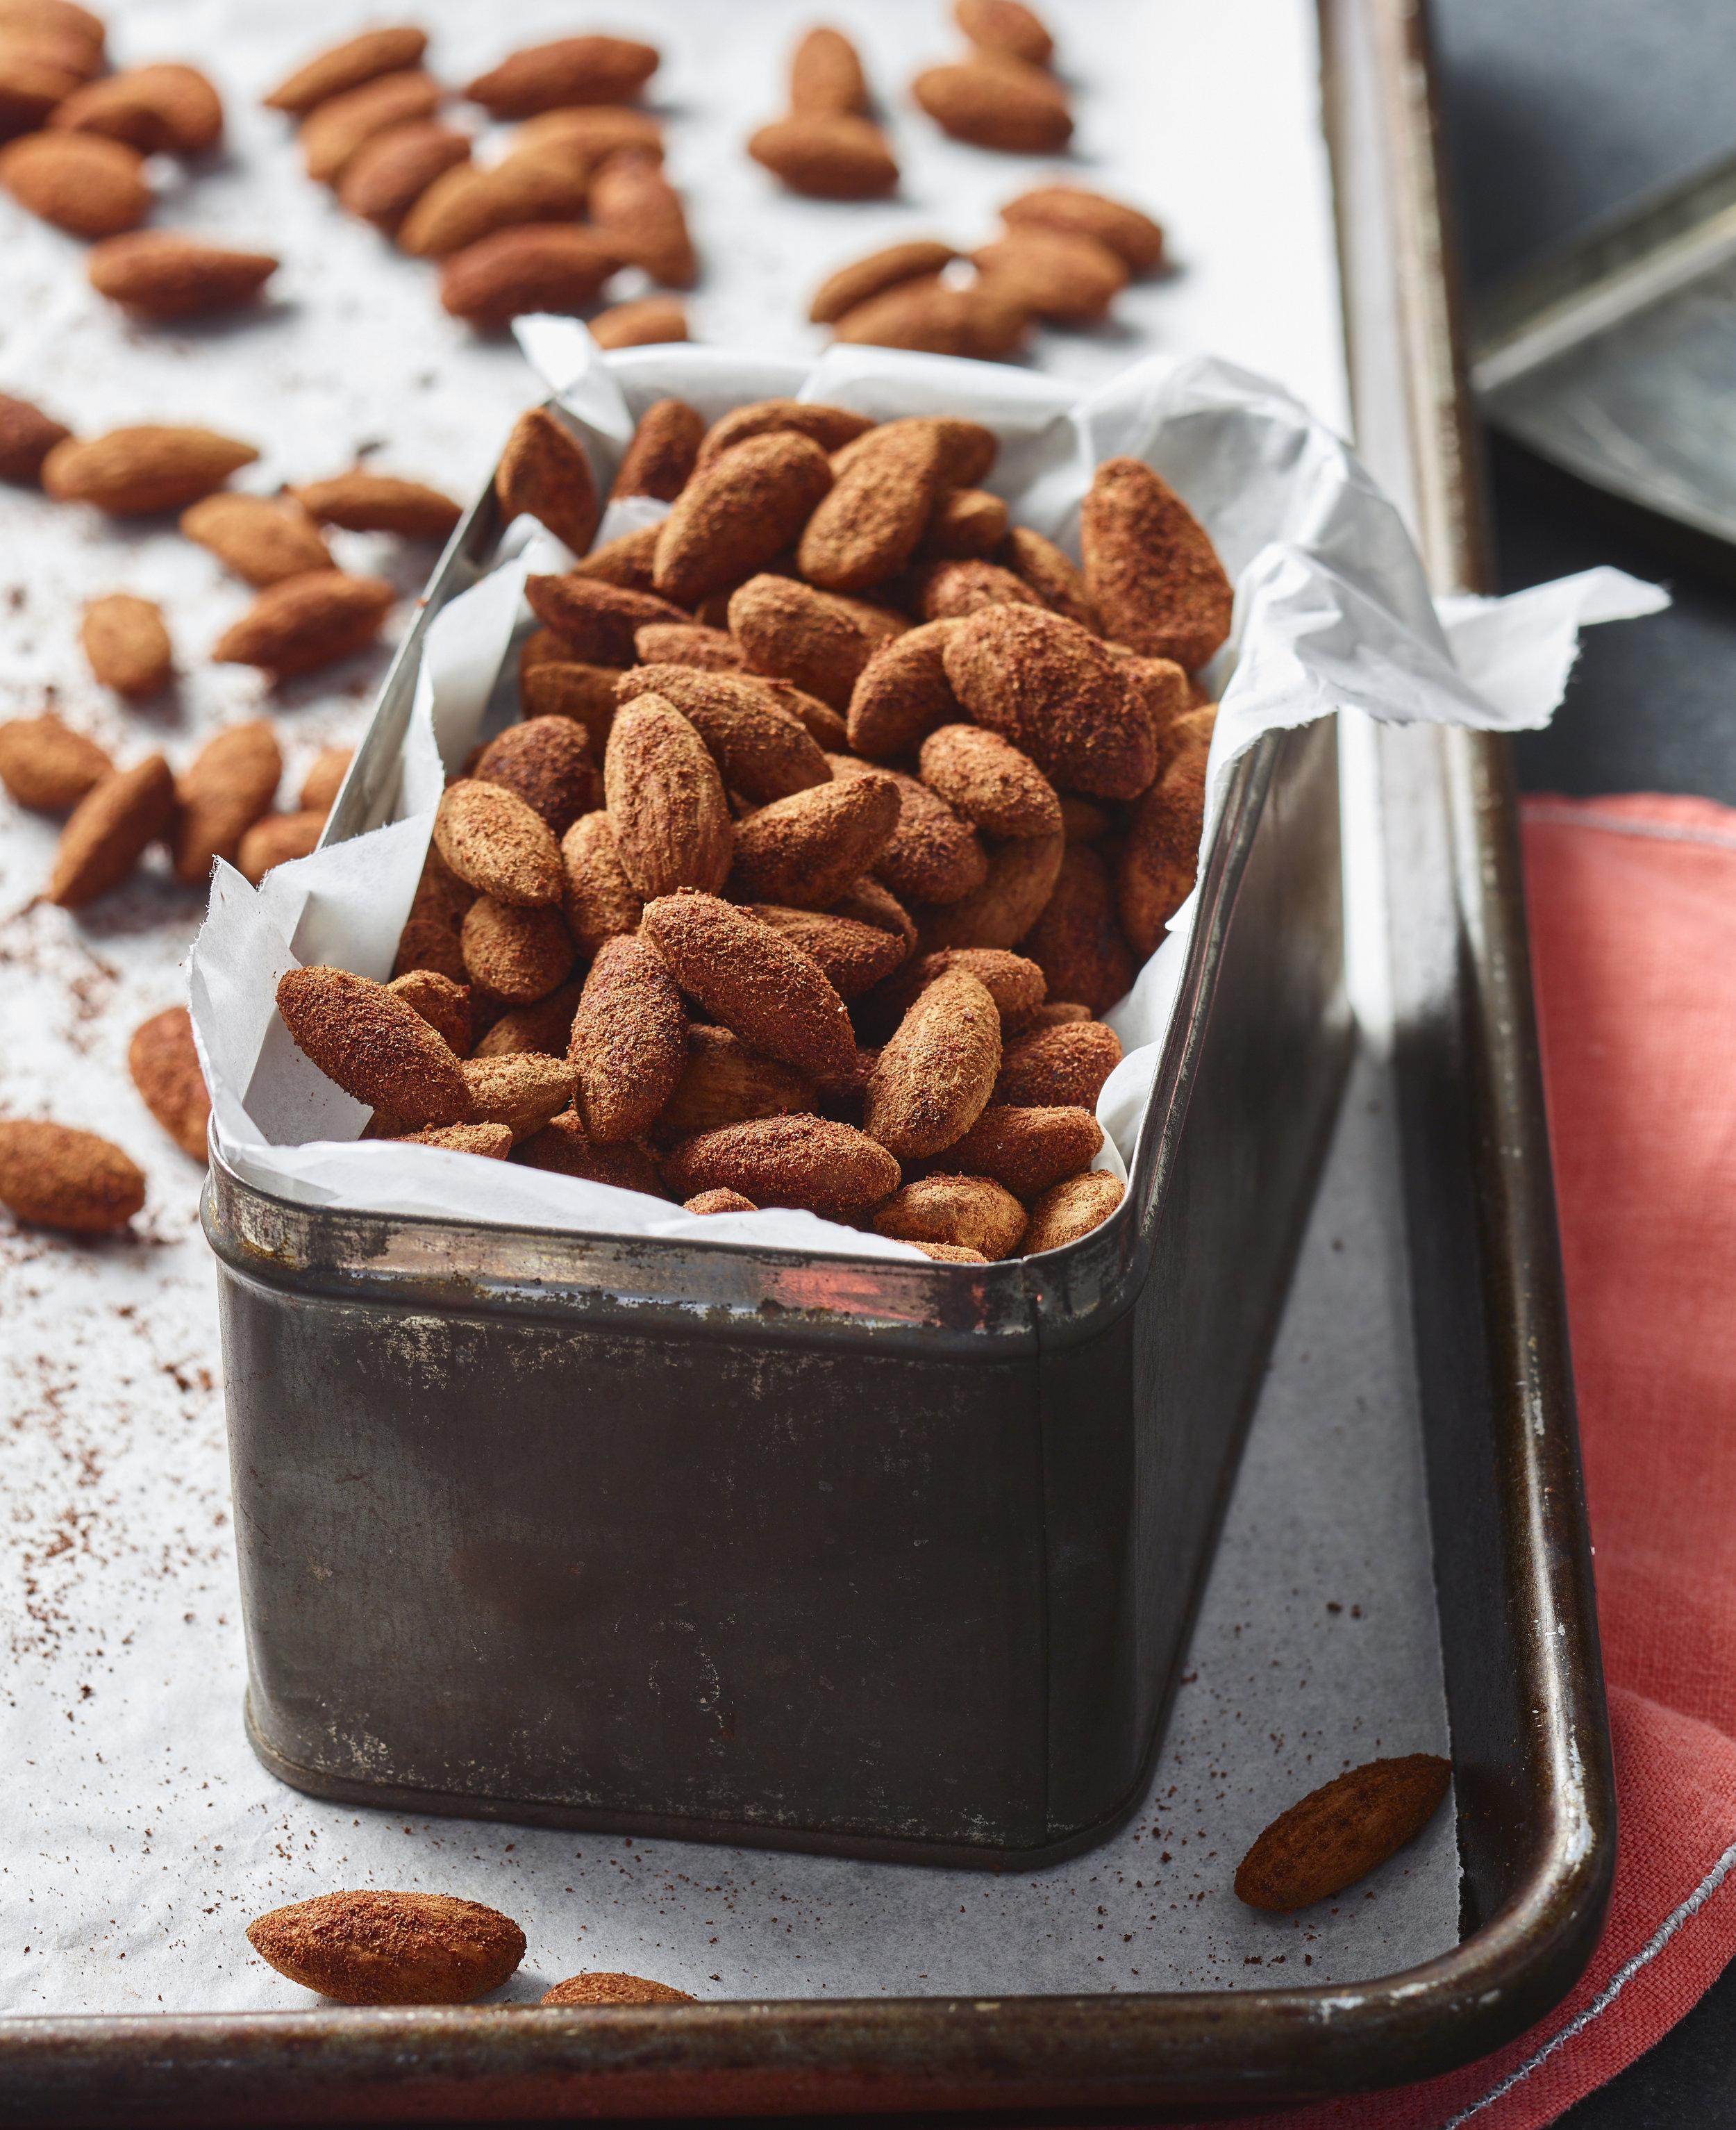 Satisfy your Sweet Tooth_Churro Almonds.jpg